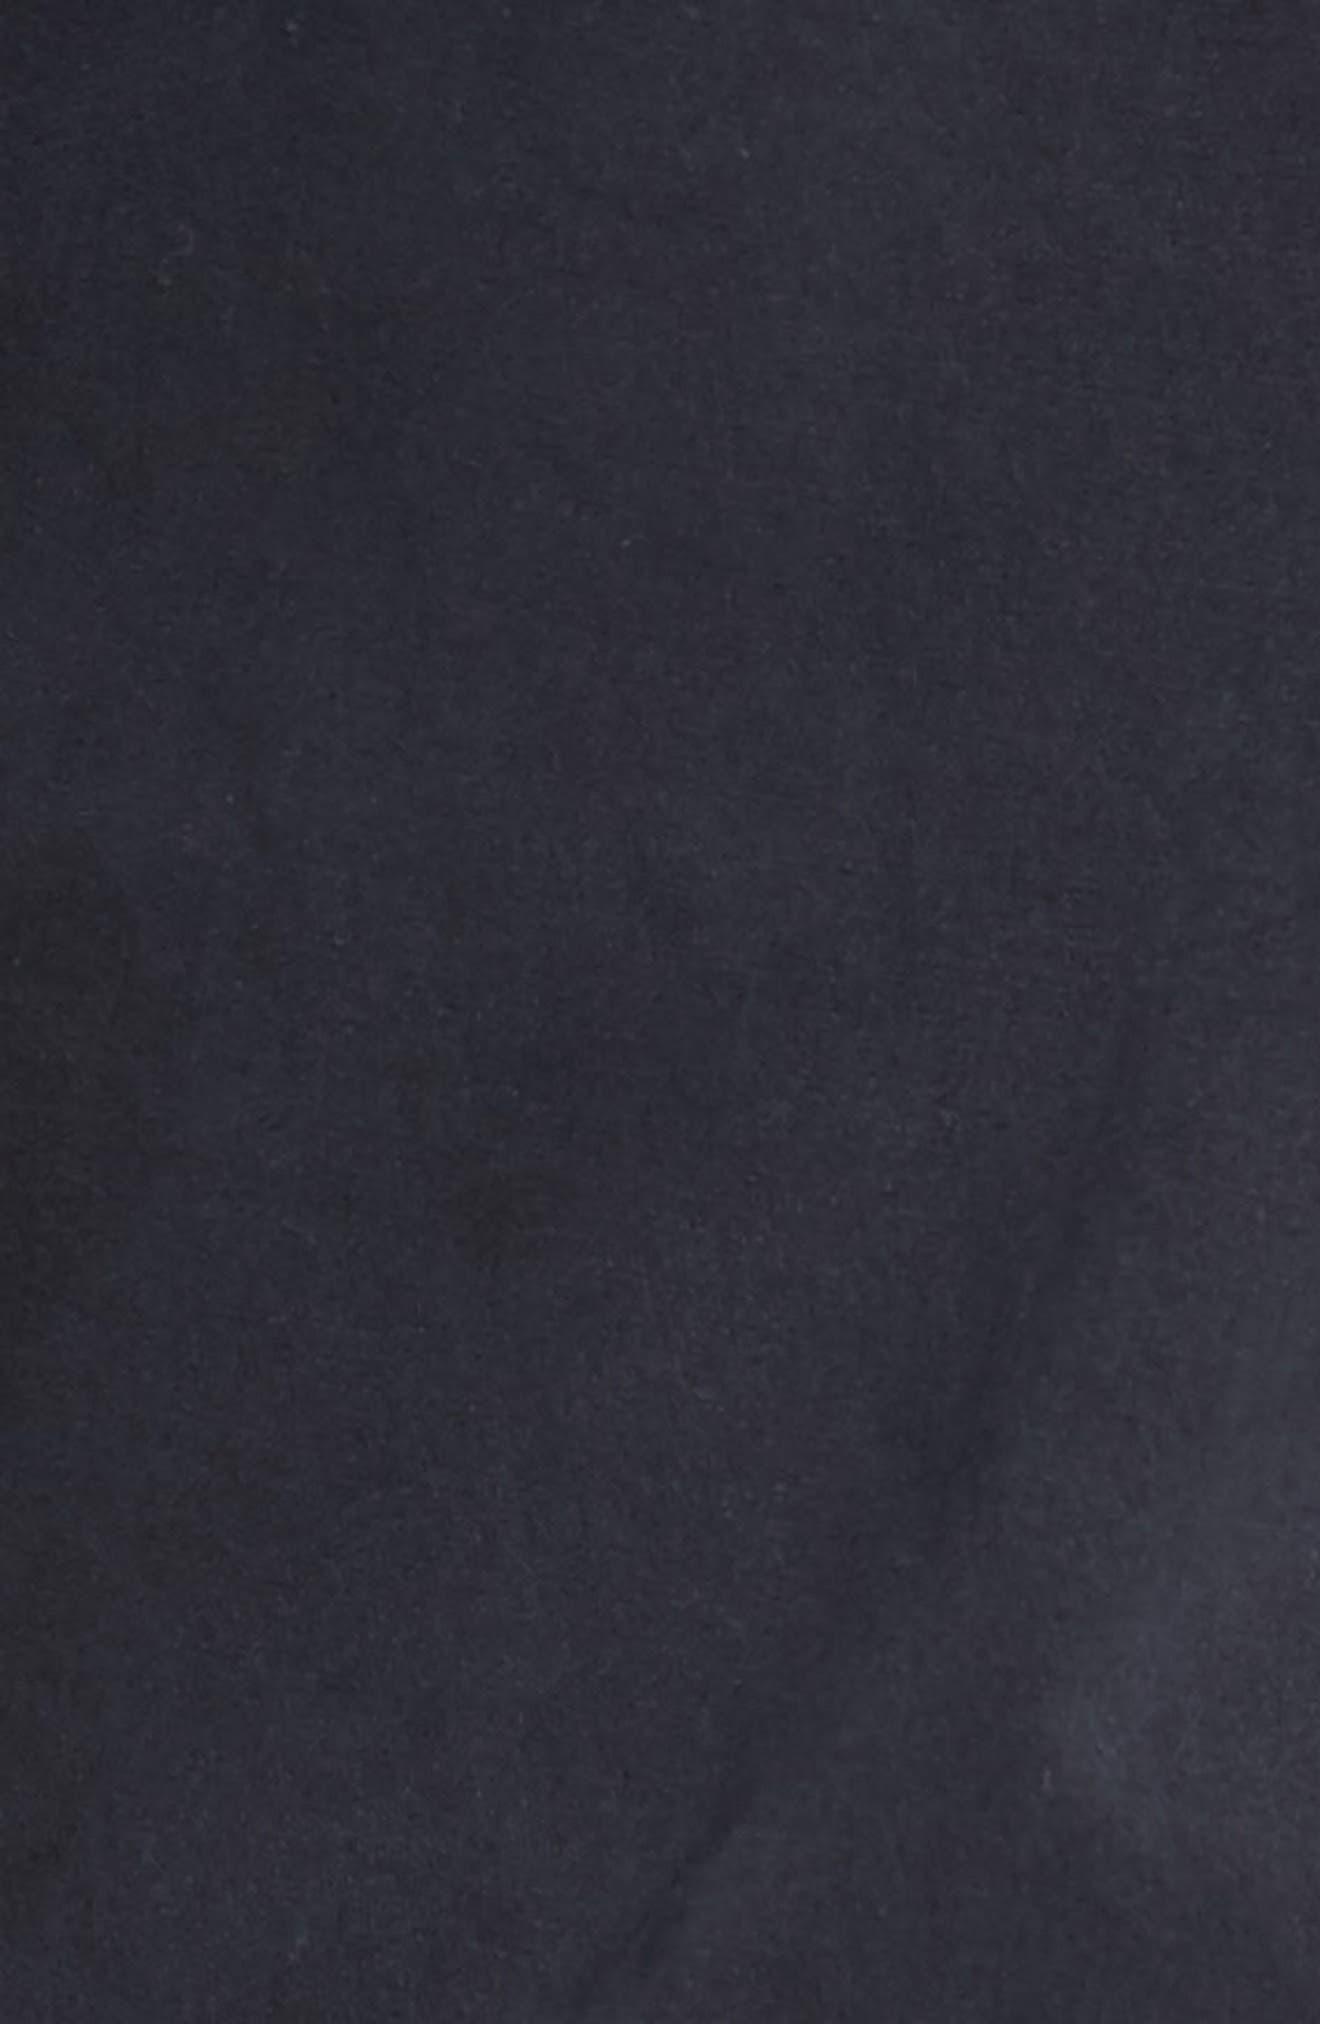 Brushed Twill Five-Pocket Pants,                             Alternate thumbnail 5, color,                             Navy